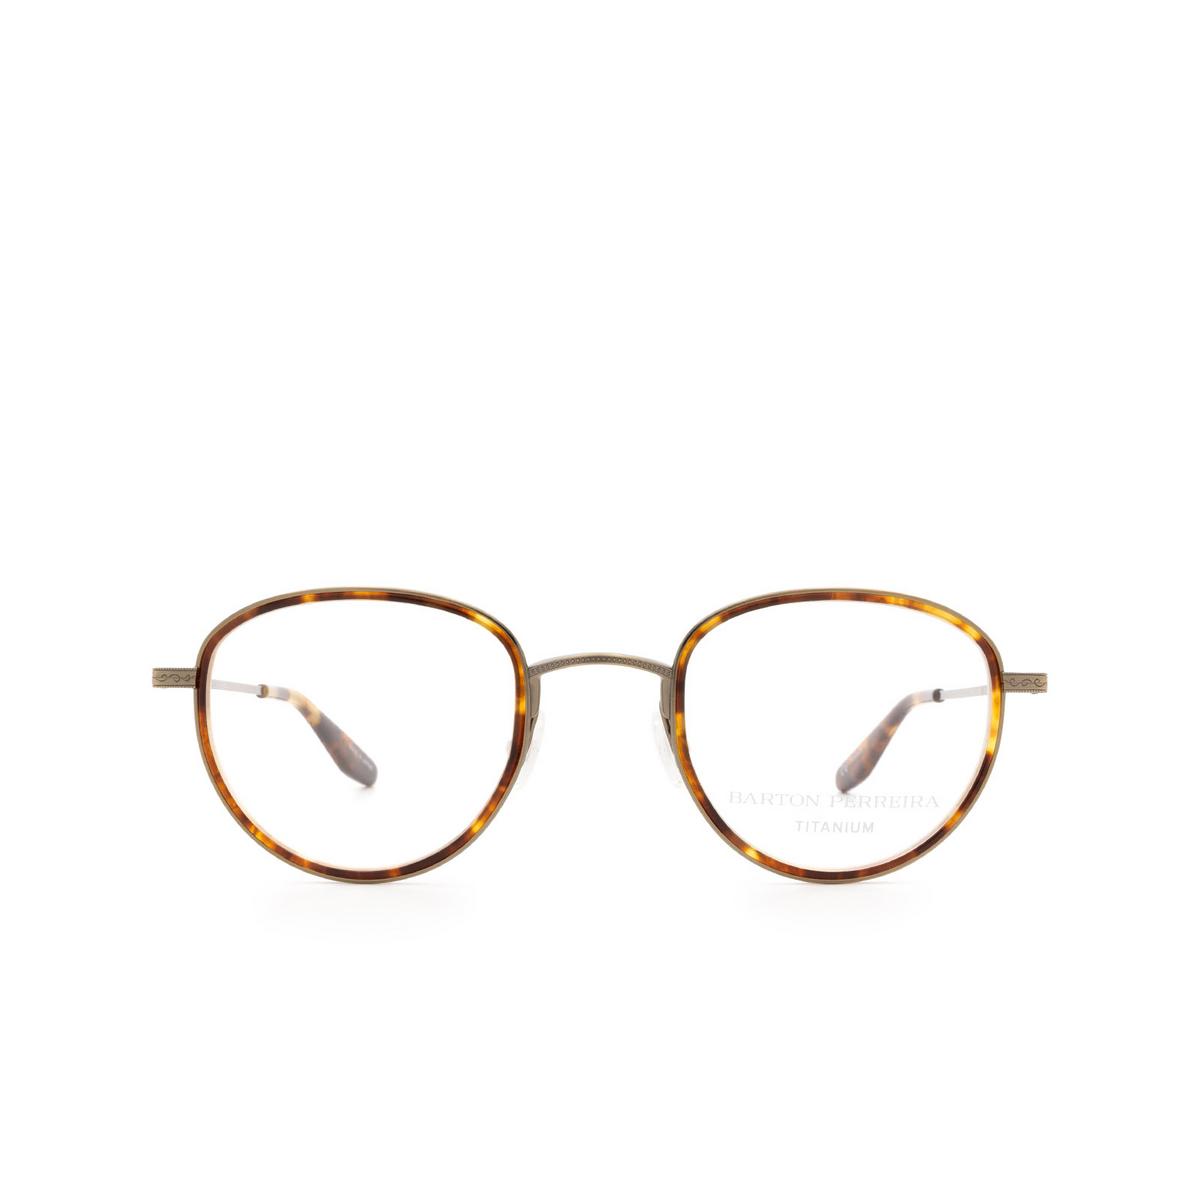 Barton Perreira® Round Eyeglasses: Esky BP5279 color Chestnut Antique Gold 0LZ - front view.